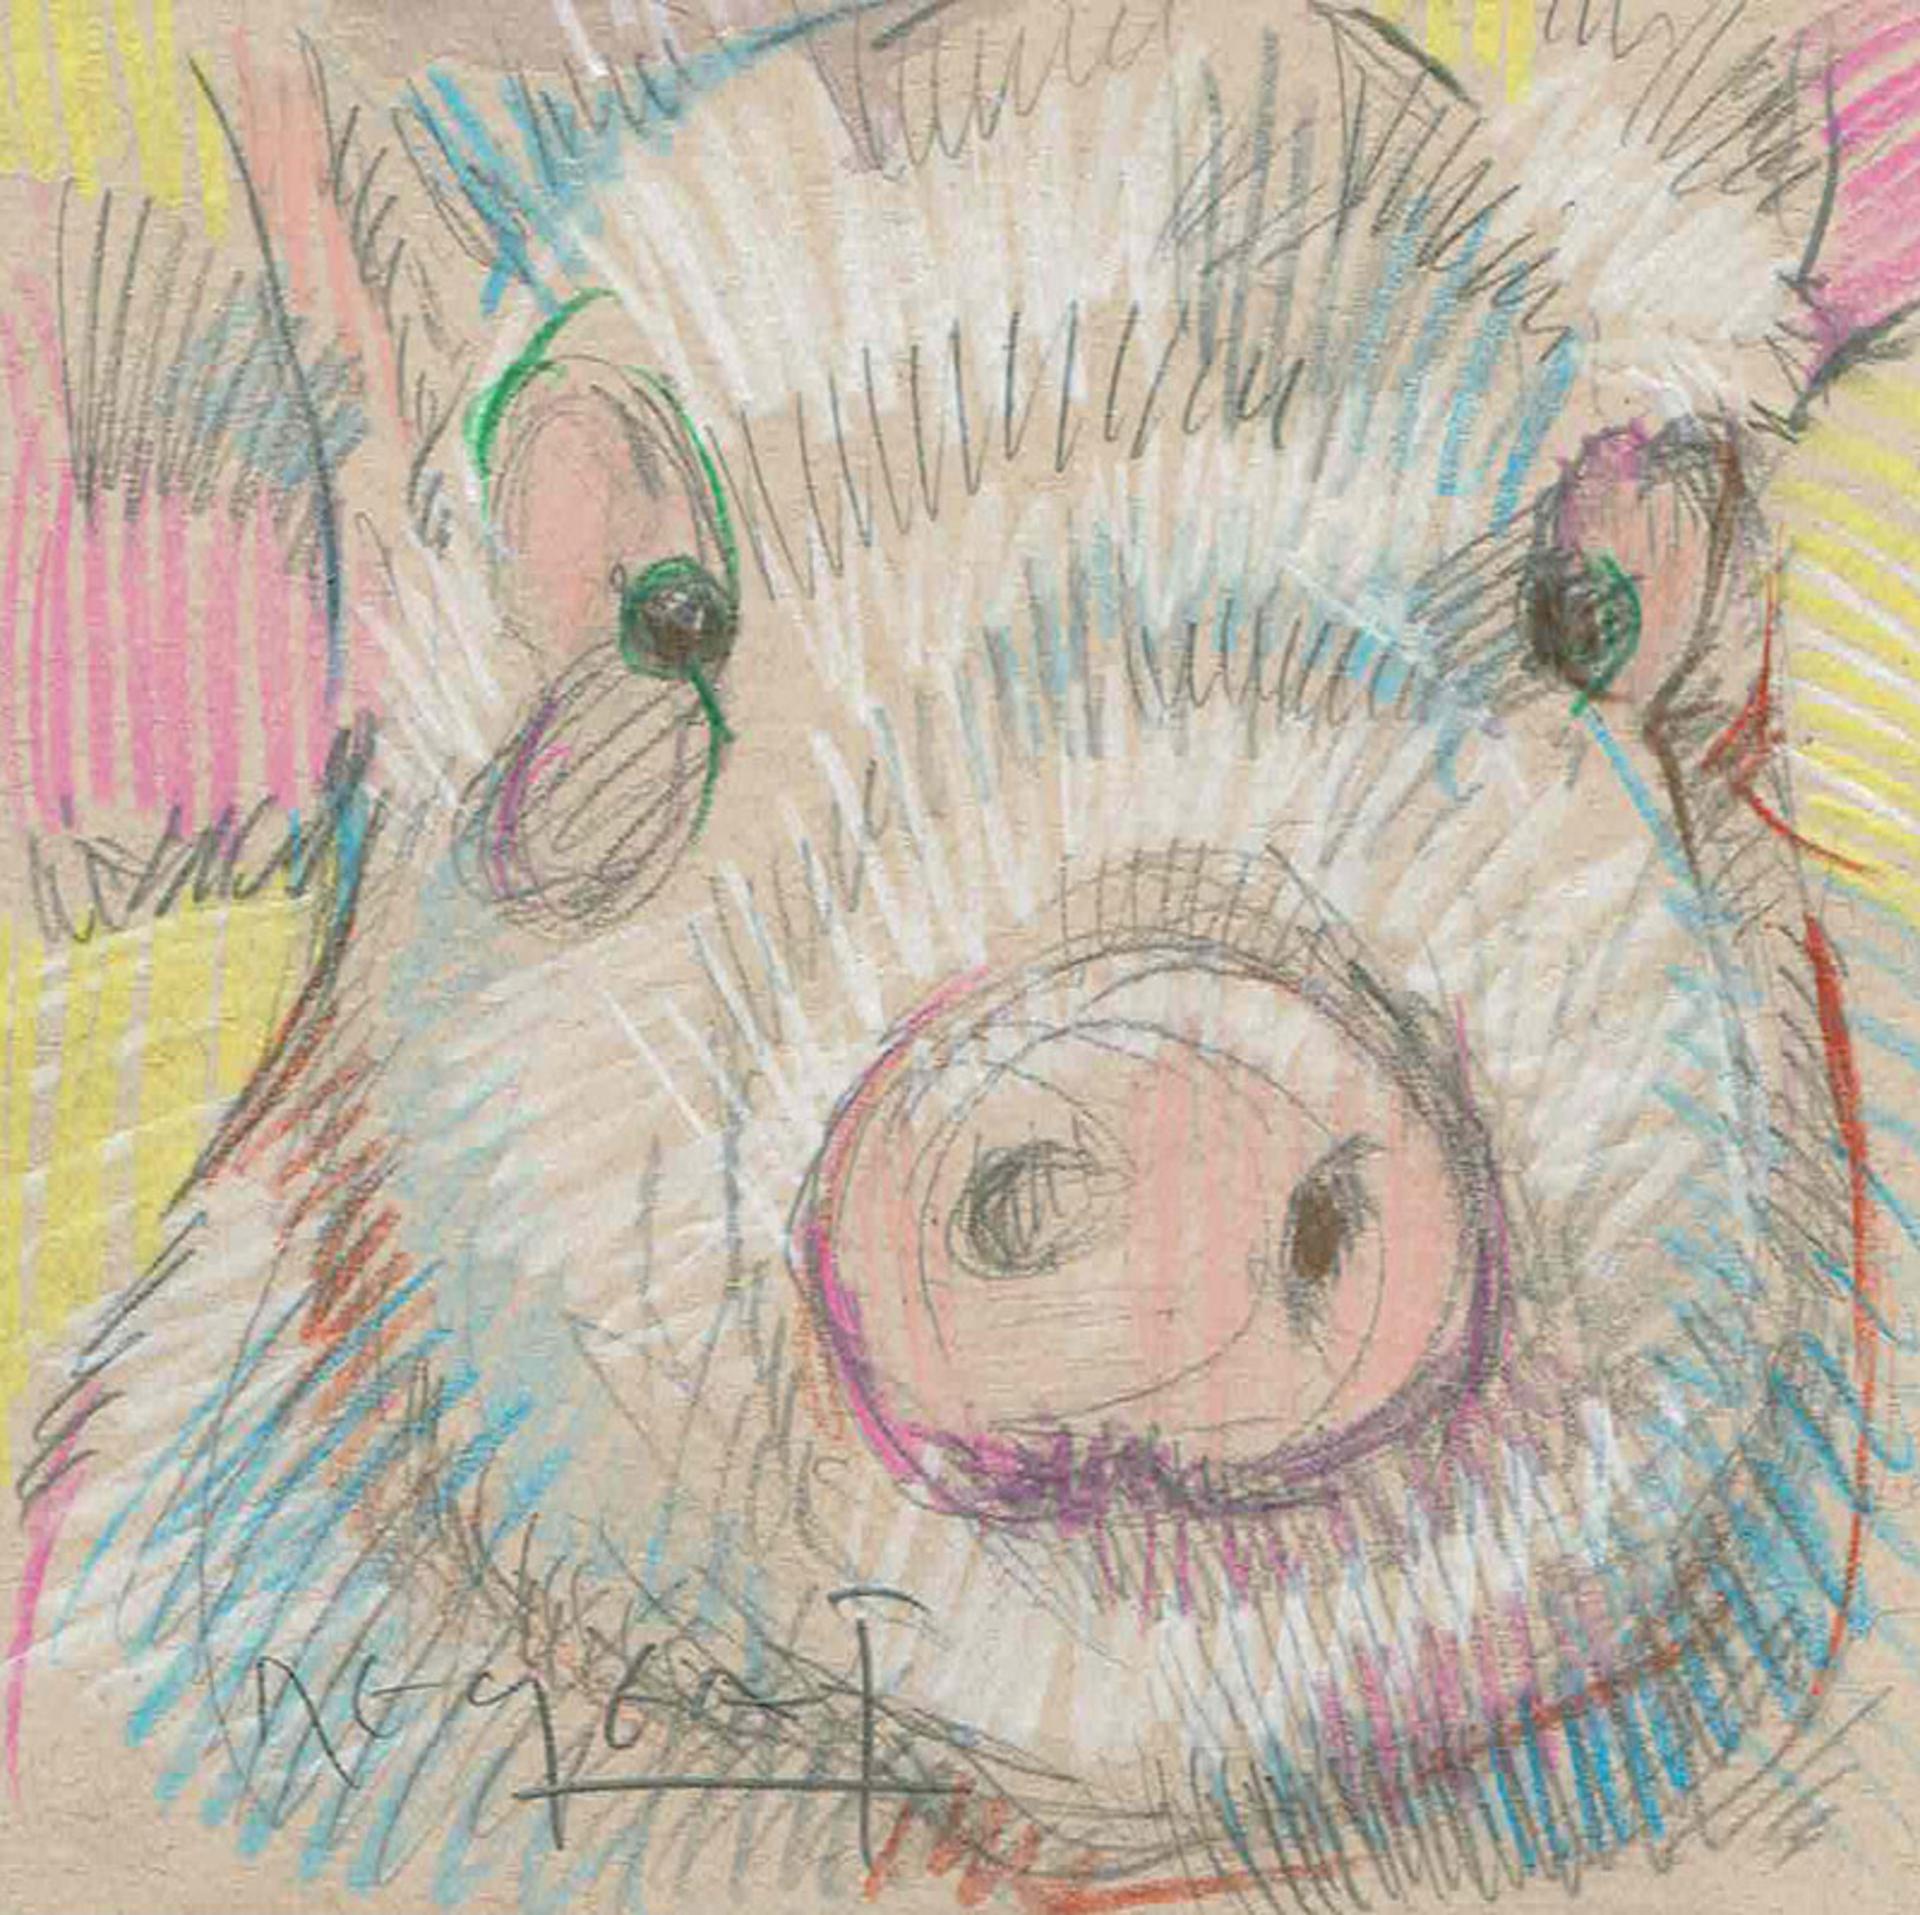 Mini Farm: Pig No. 7 by Tim Jaeger